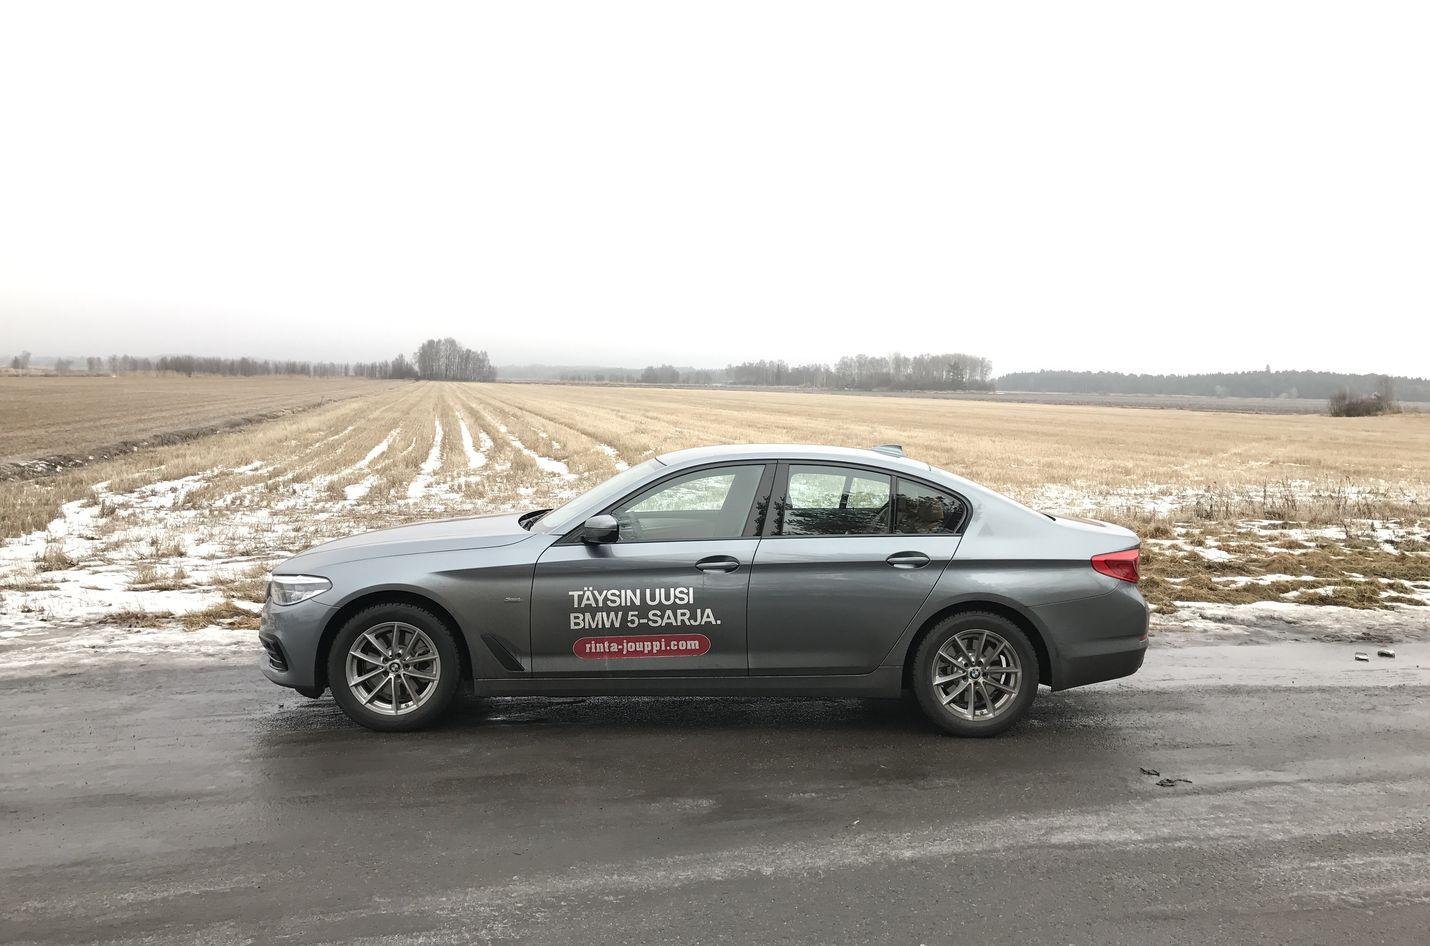 Uusi BMW 520d xDrive.